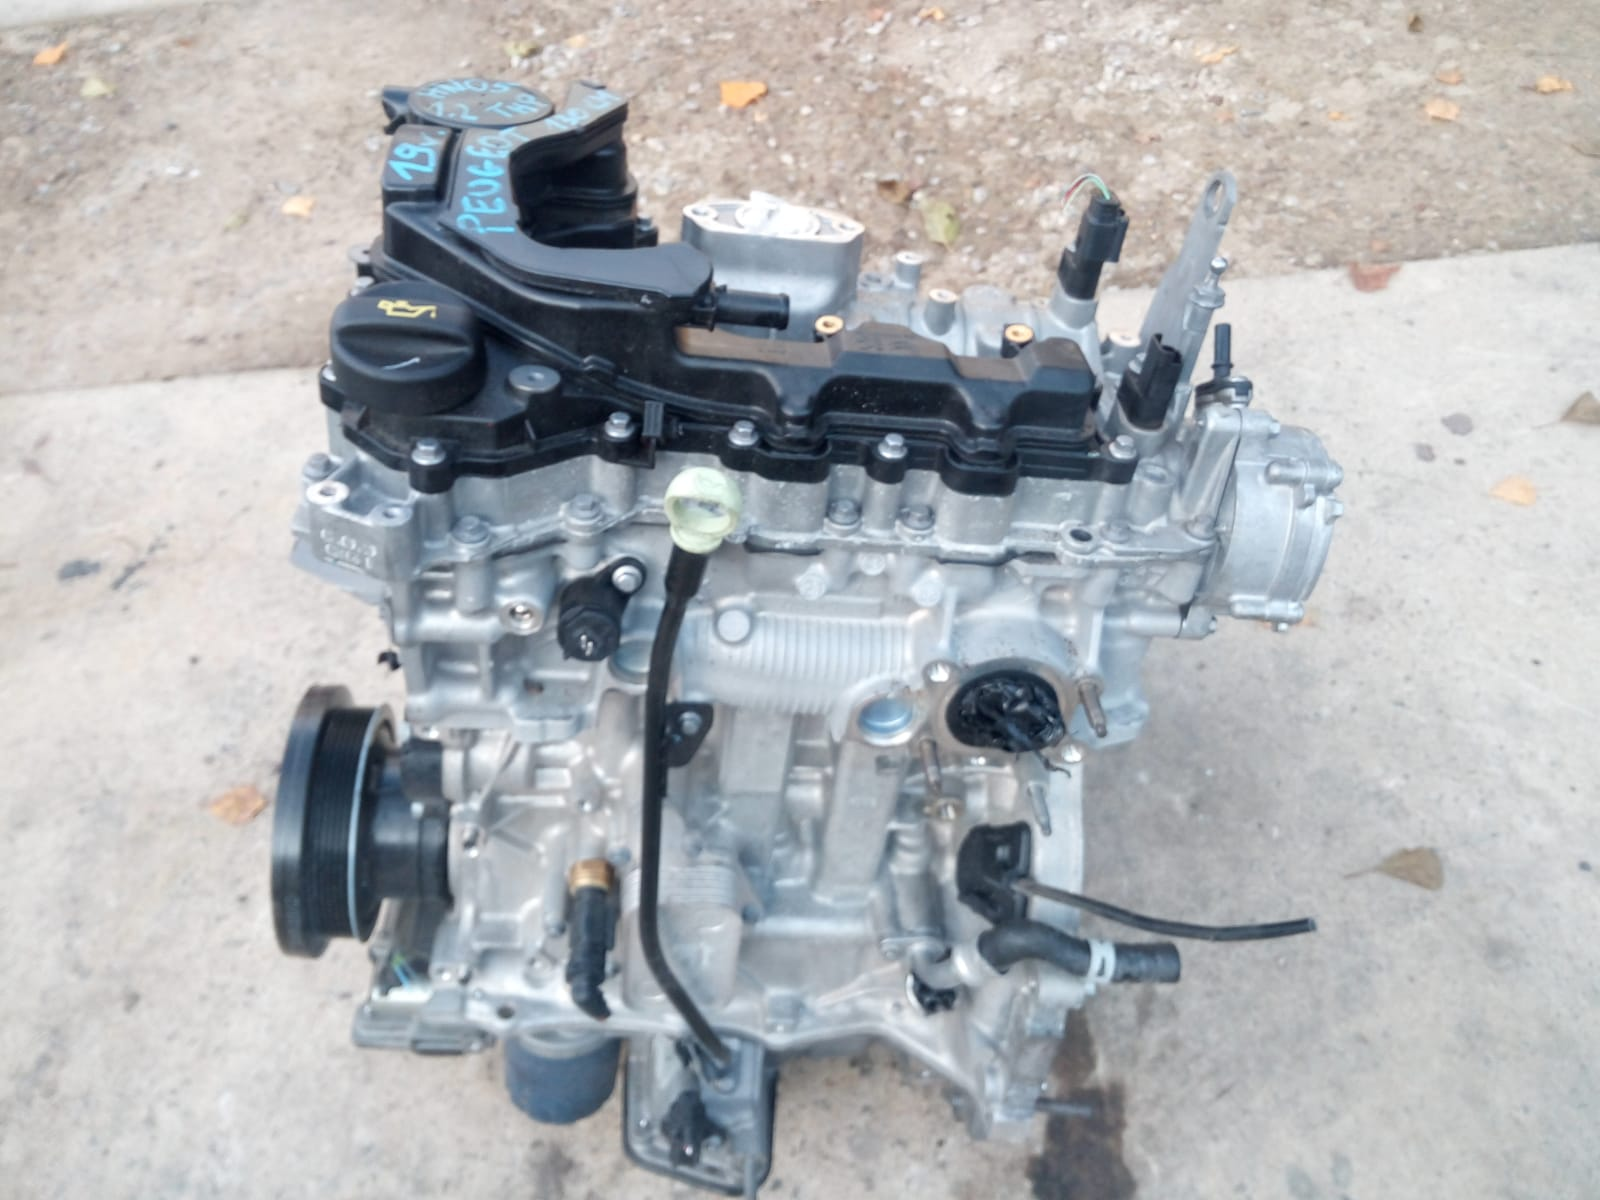 Silnik Peugeot 1.2 THP 130 KM 2019r HN05